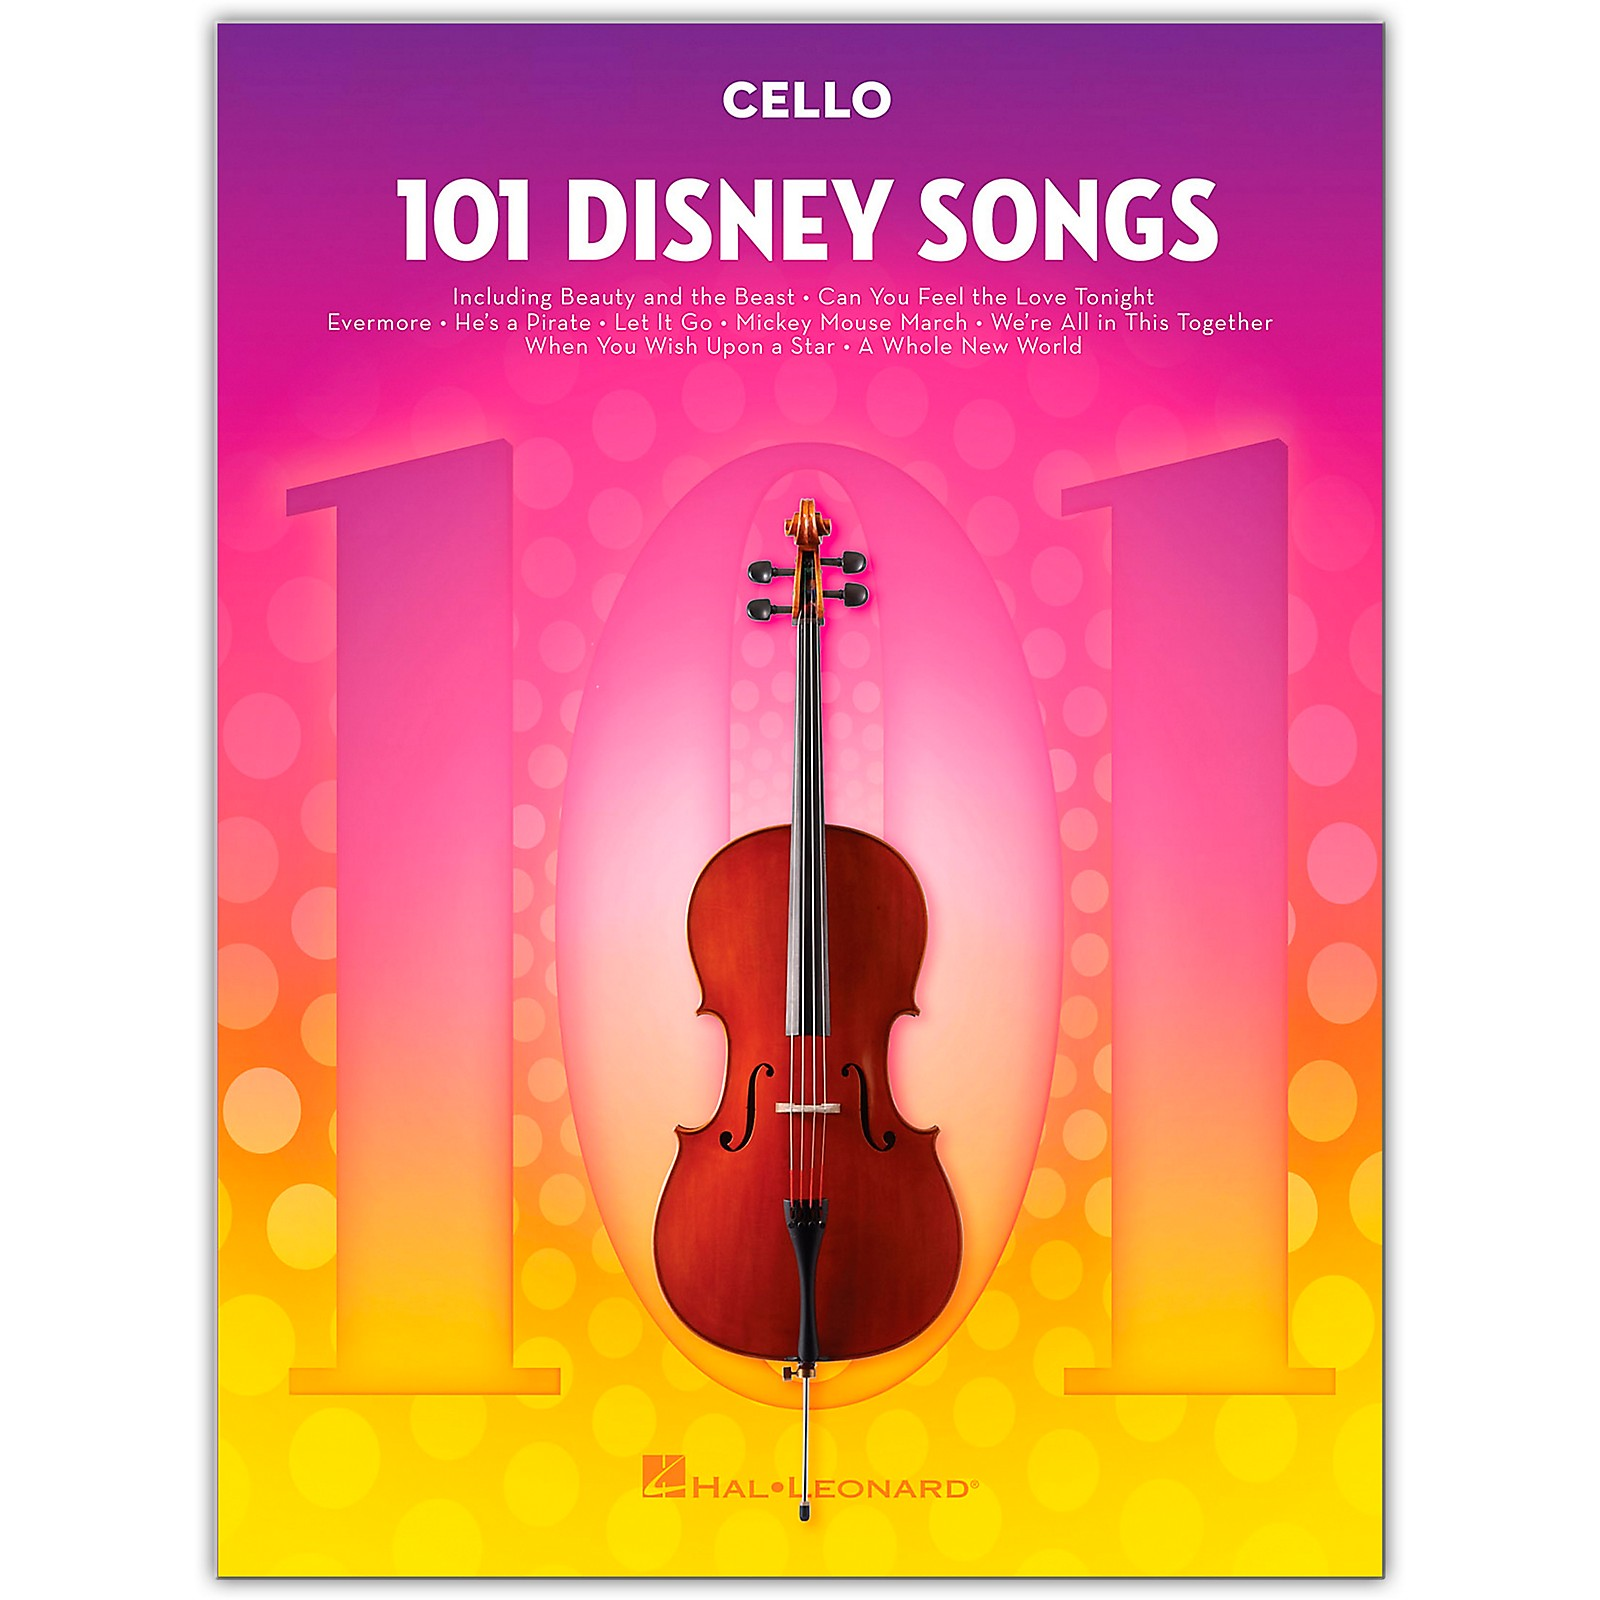 Hal Leonard 101 Disney Songs  for Cello